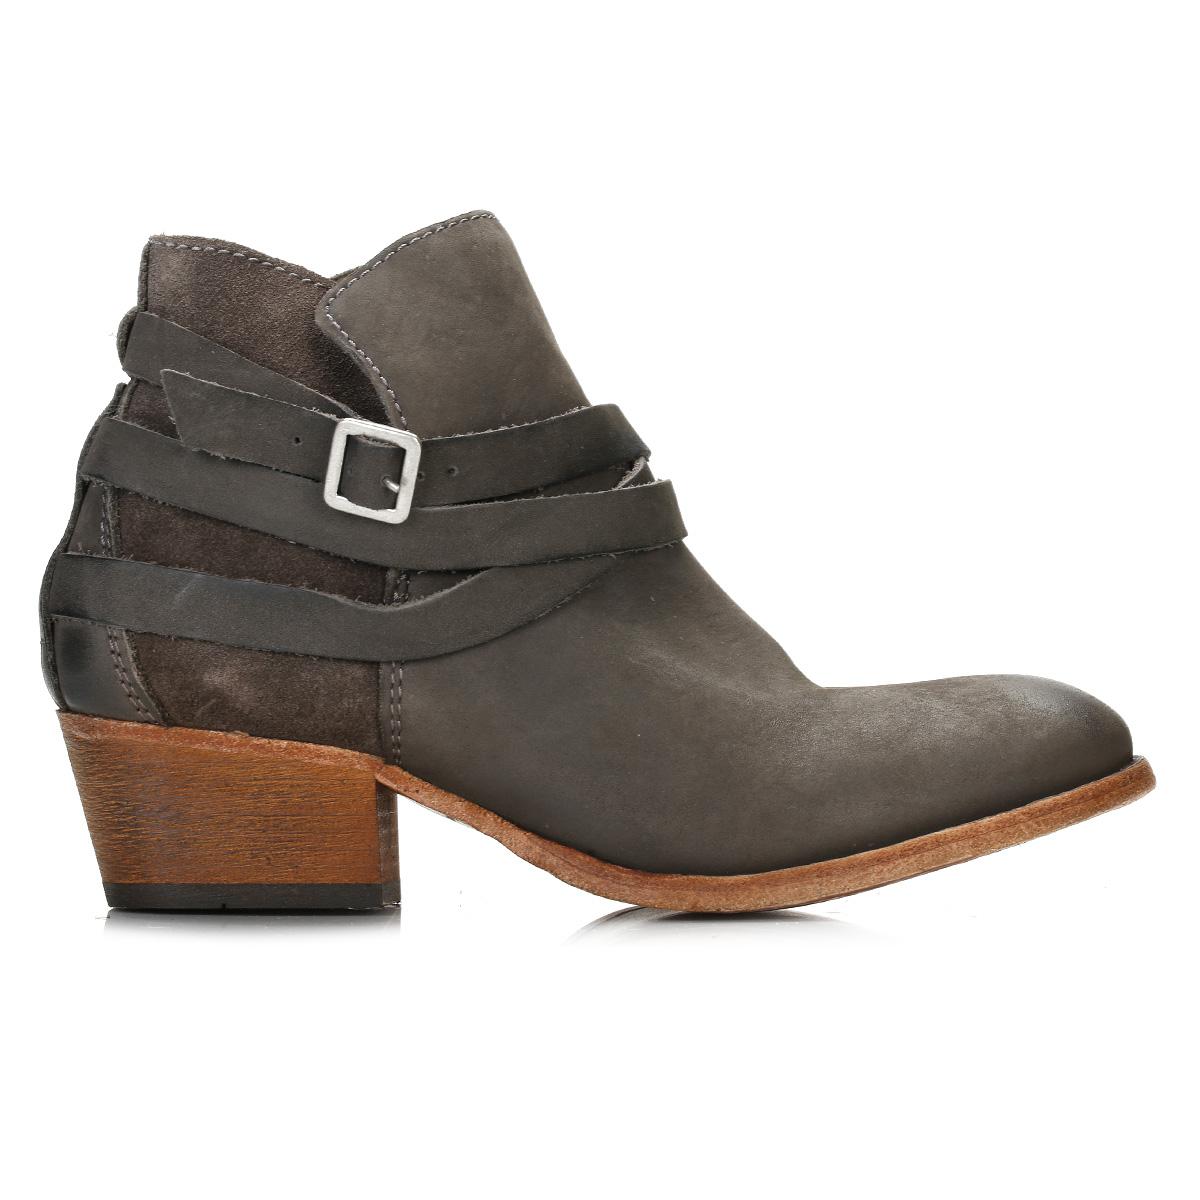 Grey Mid Heel Shoes Uk